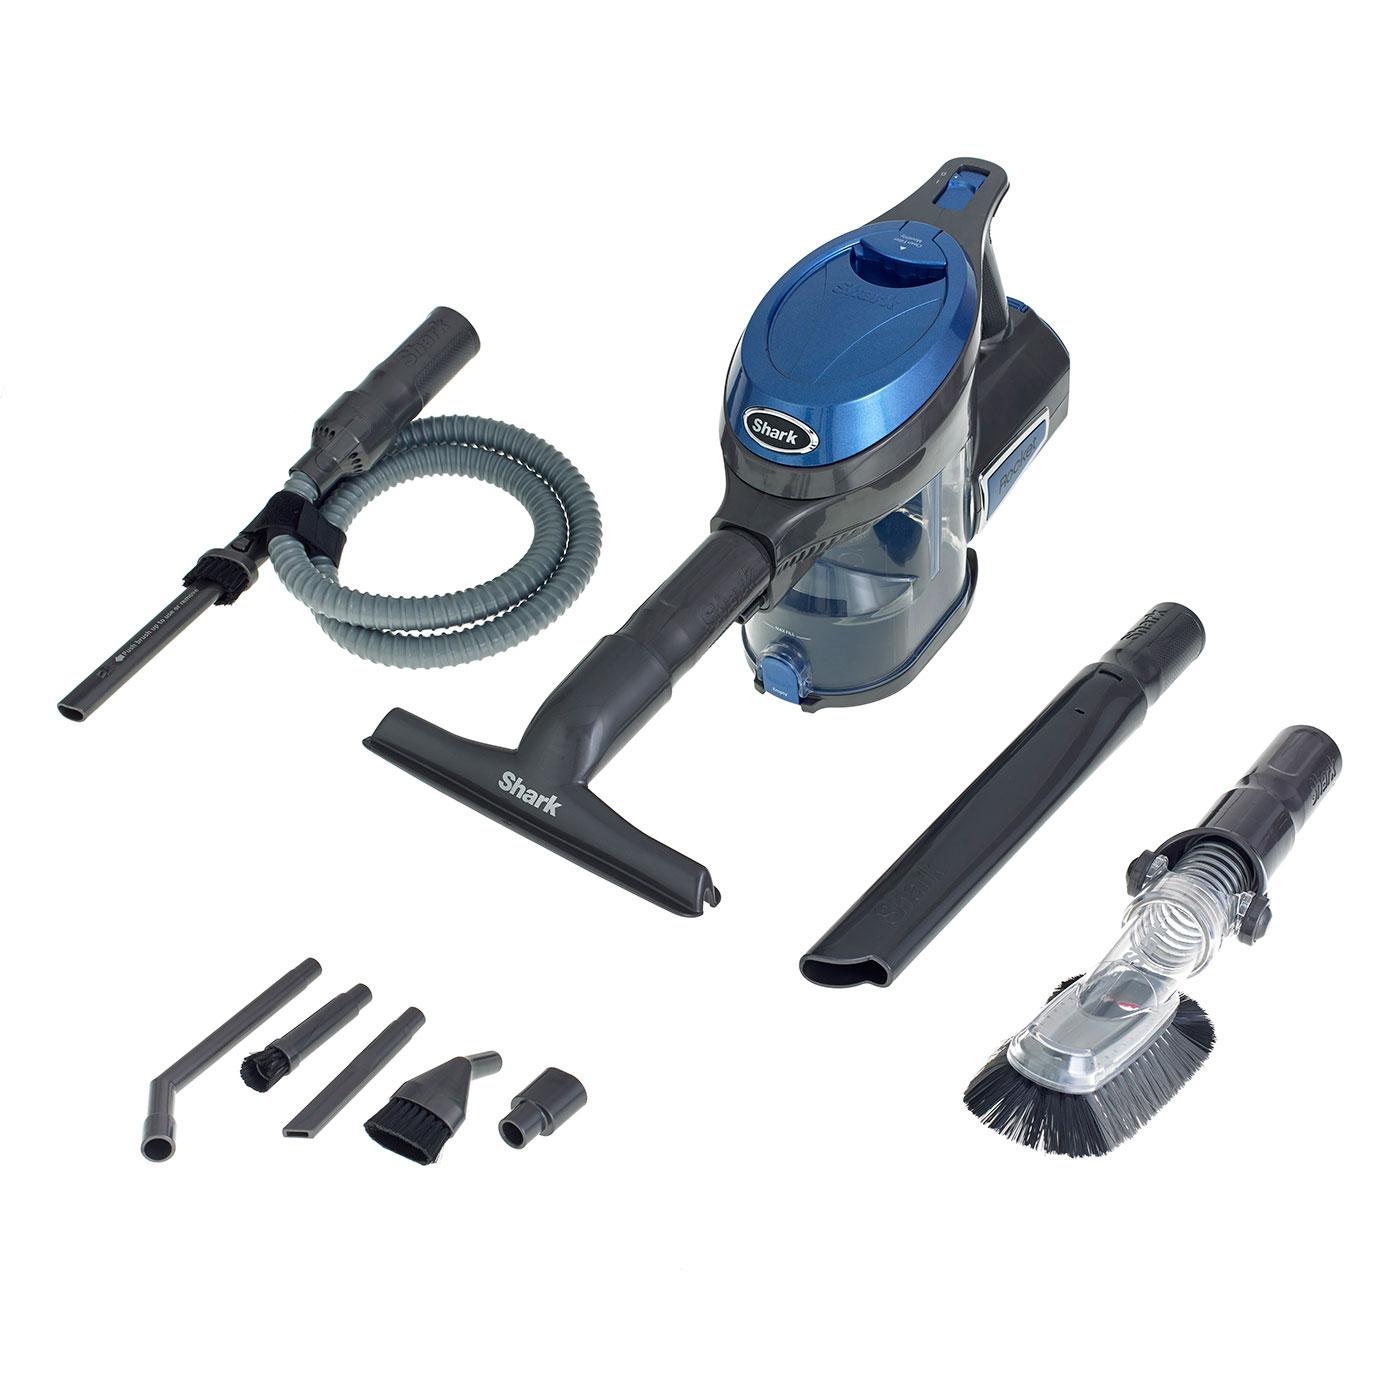 Shark Corded Handheld Vacuum Cleaner Hv292uk